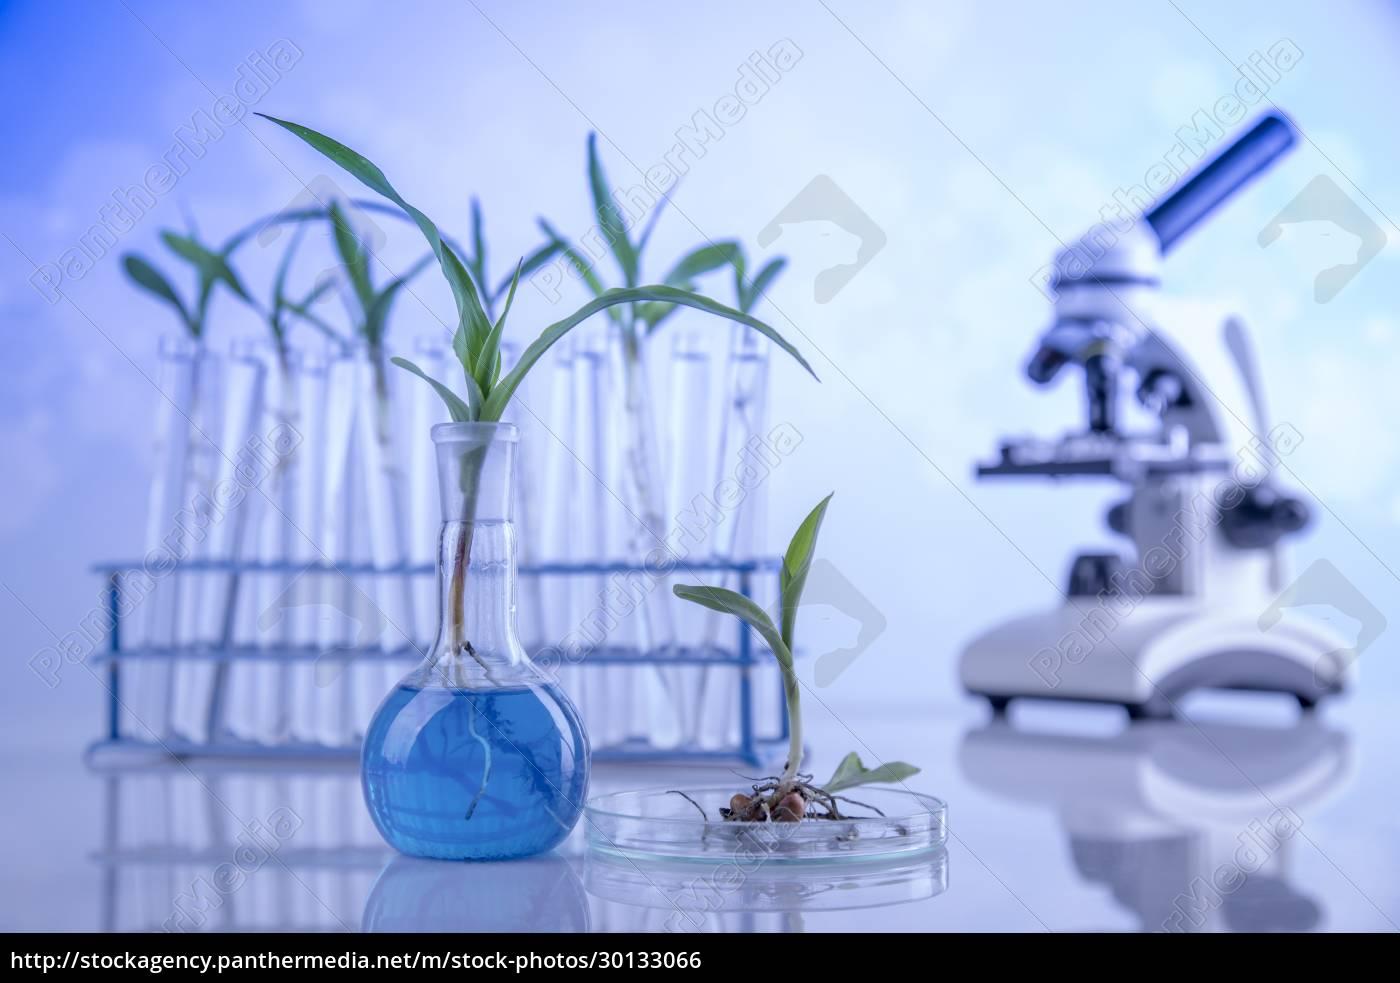 chemistry, equipment, , plants, laboratory, experimental - 30133066